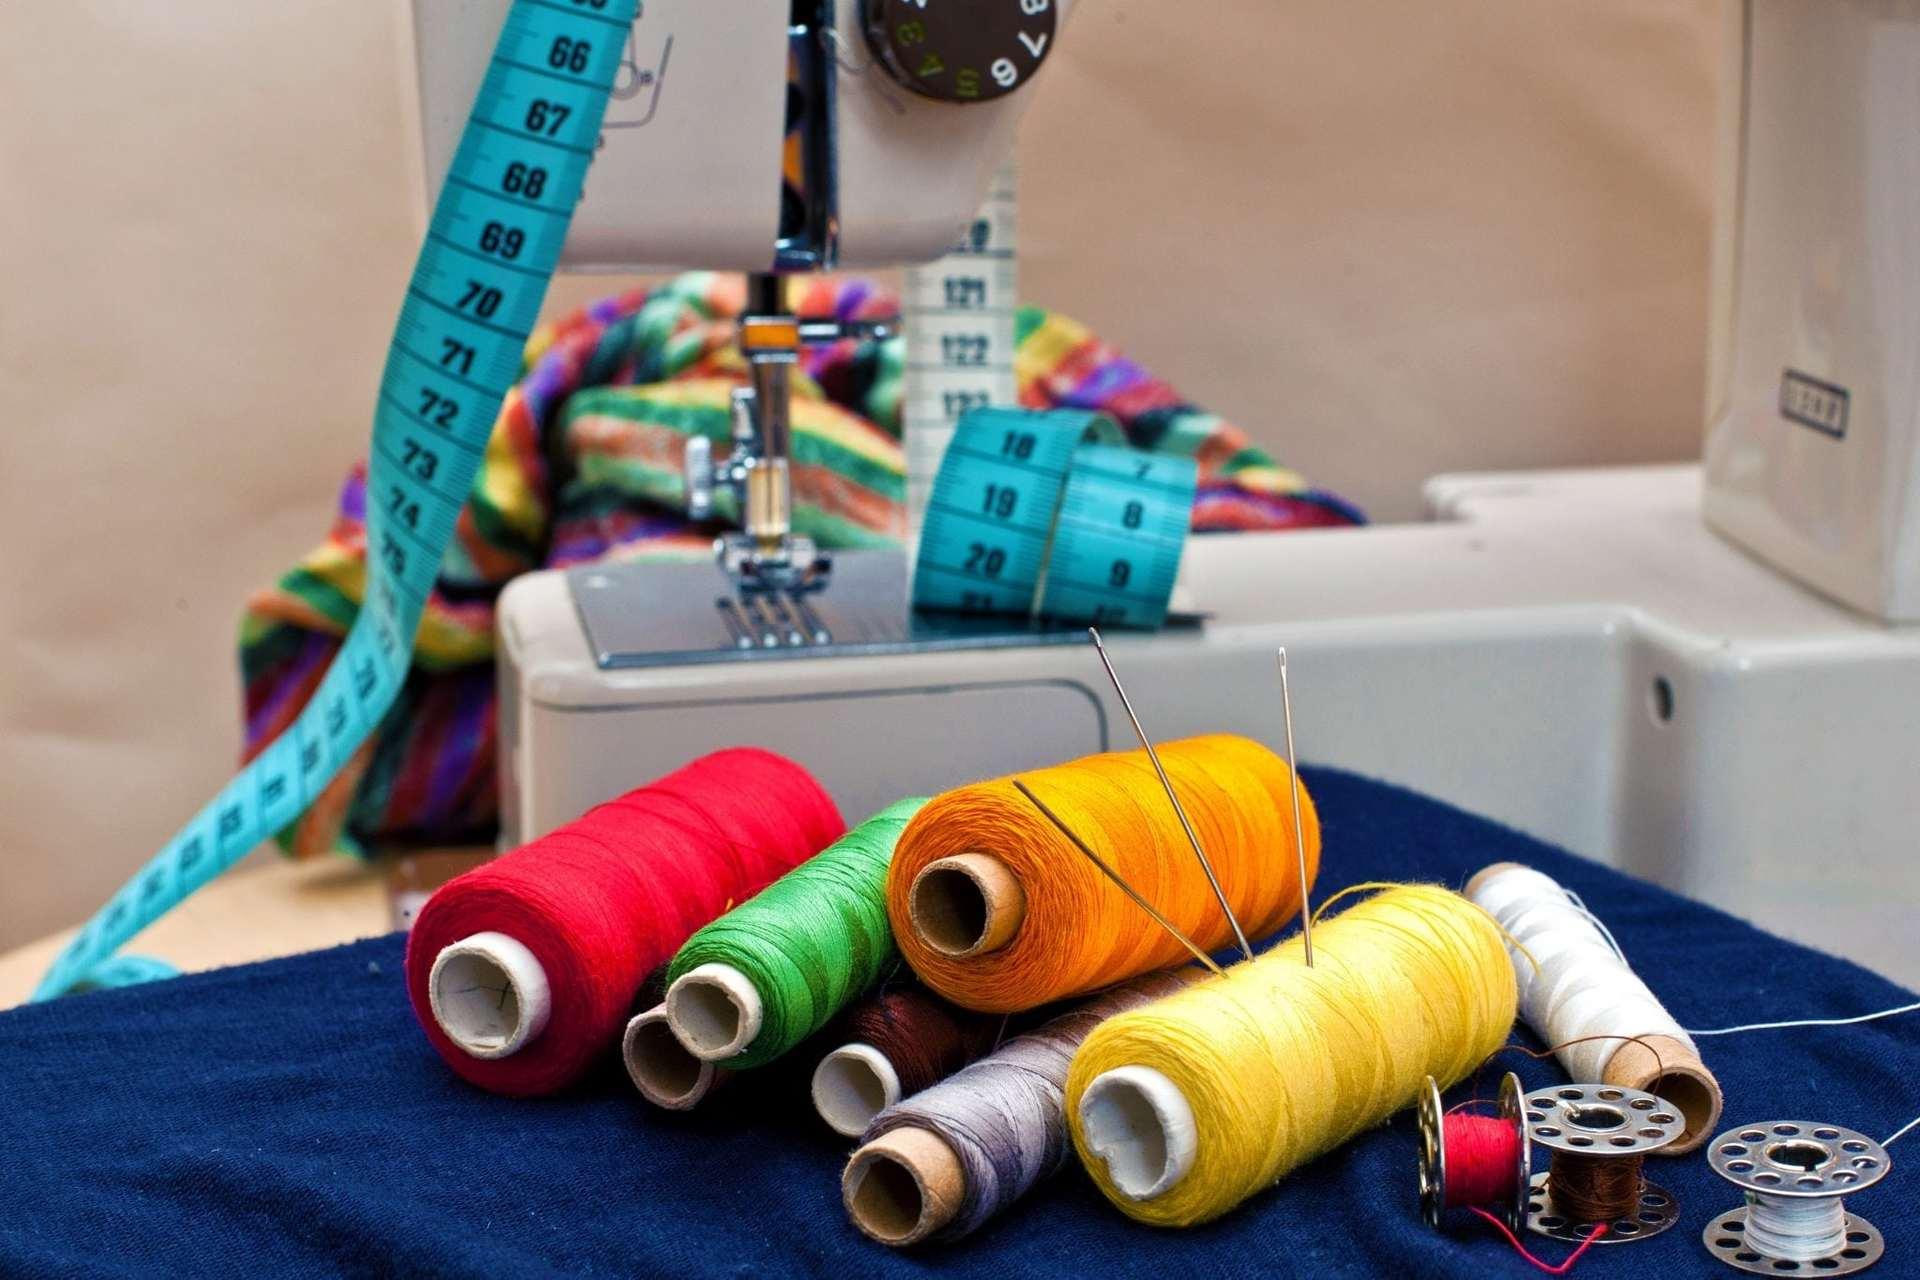 материалы для пошива штор